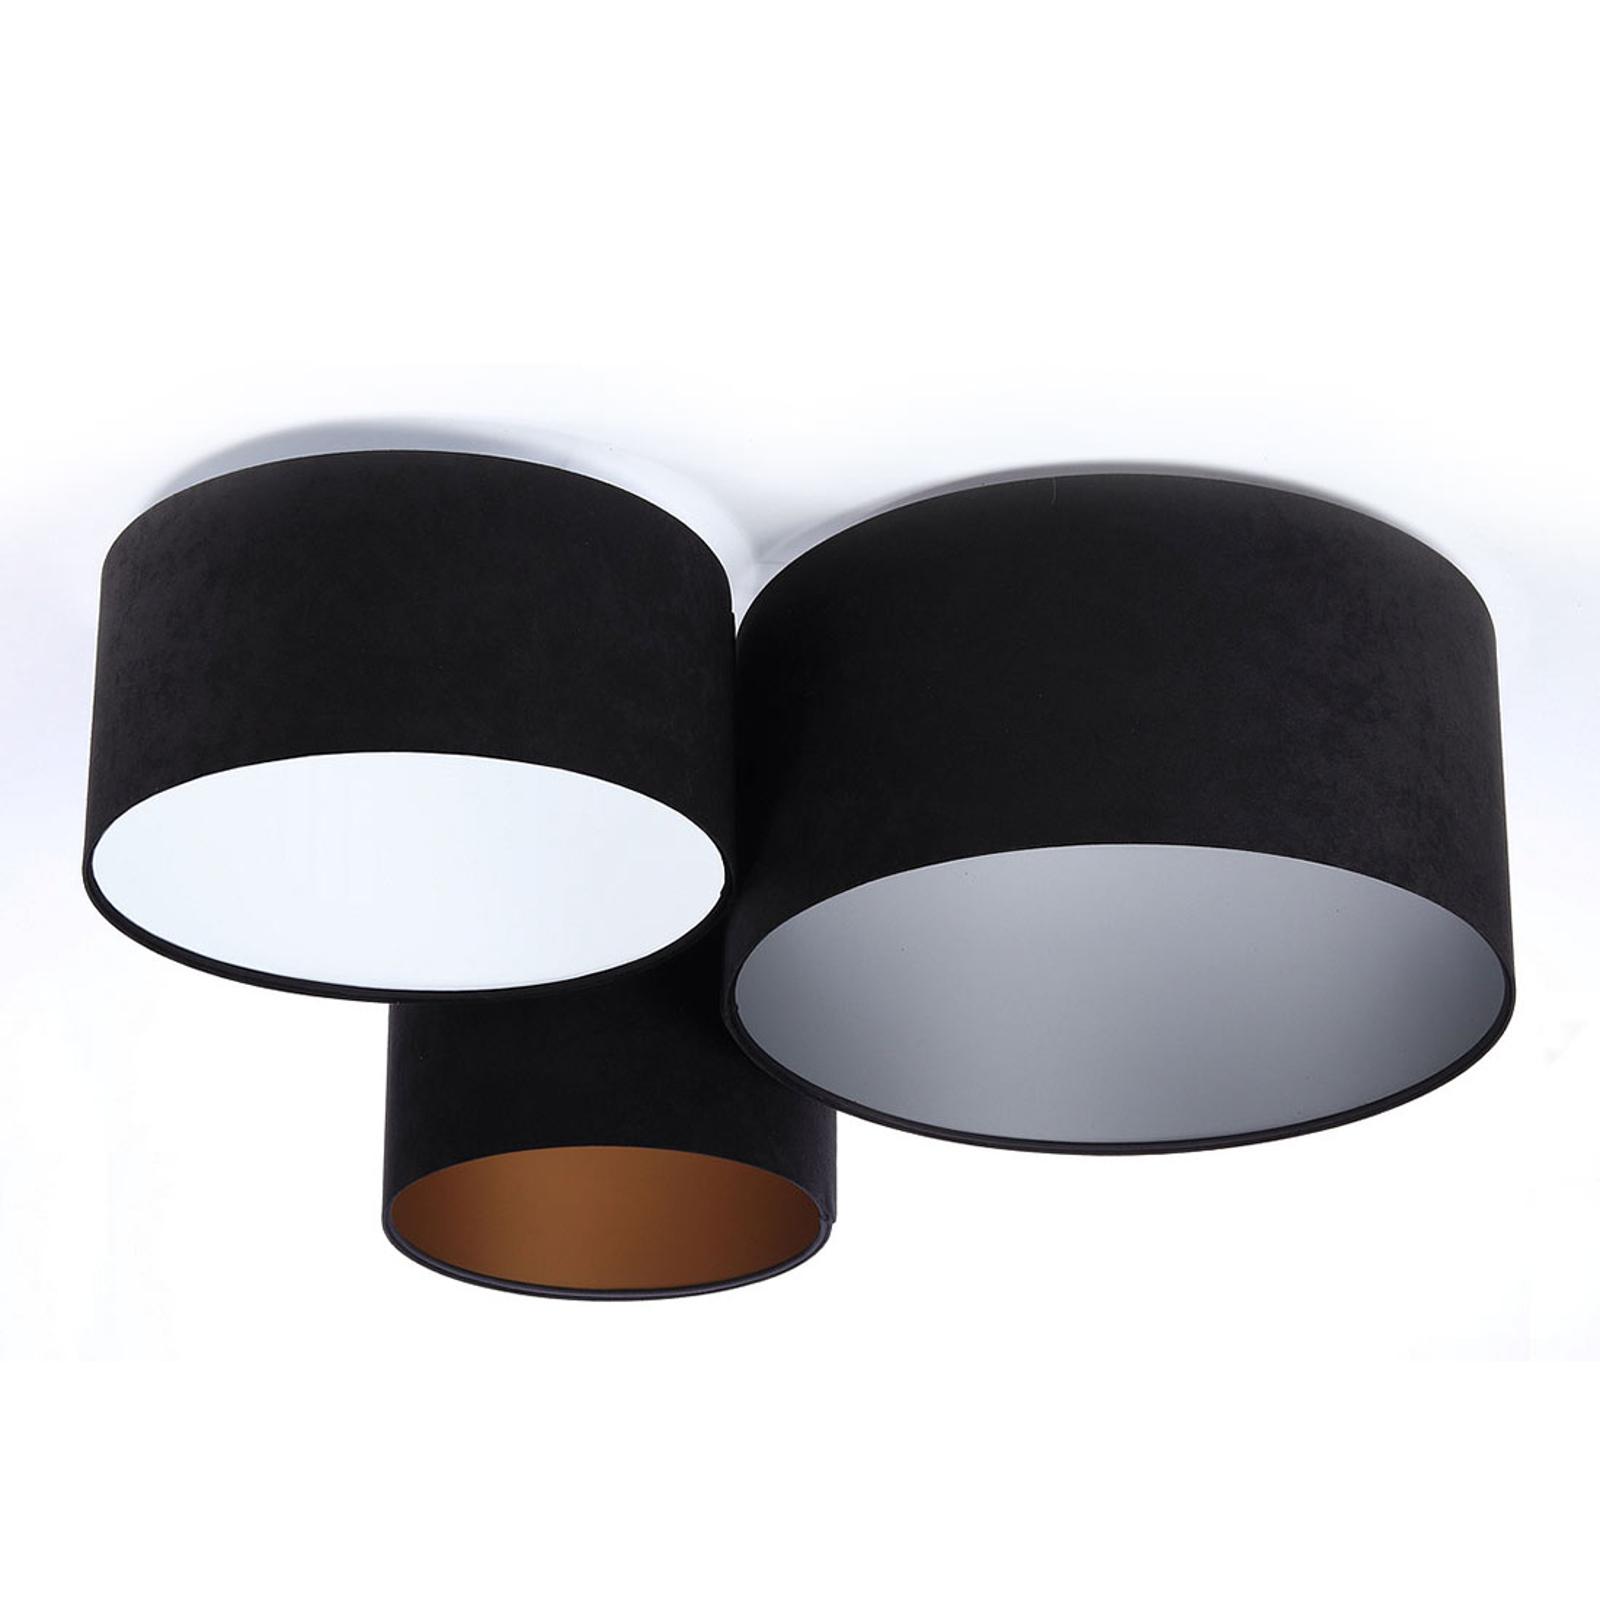 Lampa sufitowa 080, czarna+trójkolorowa